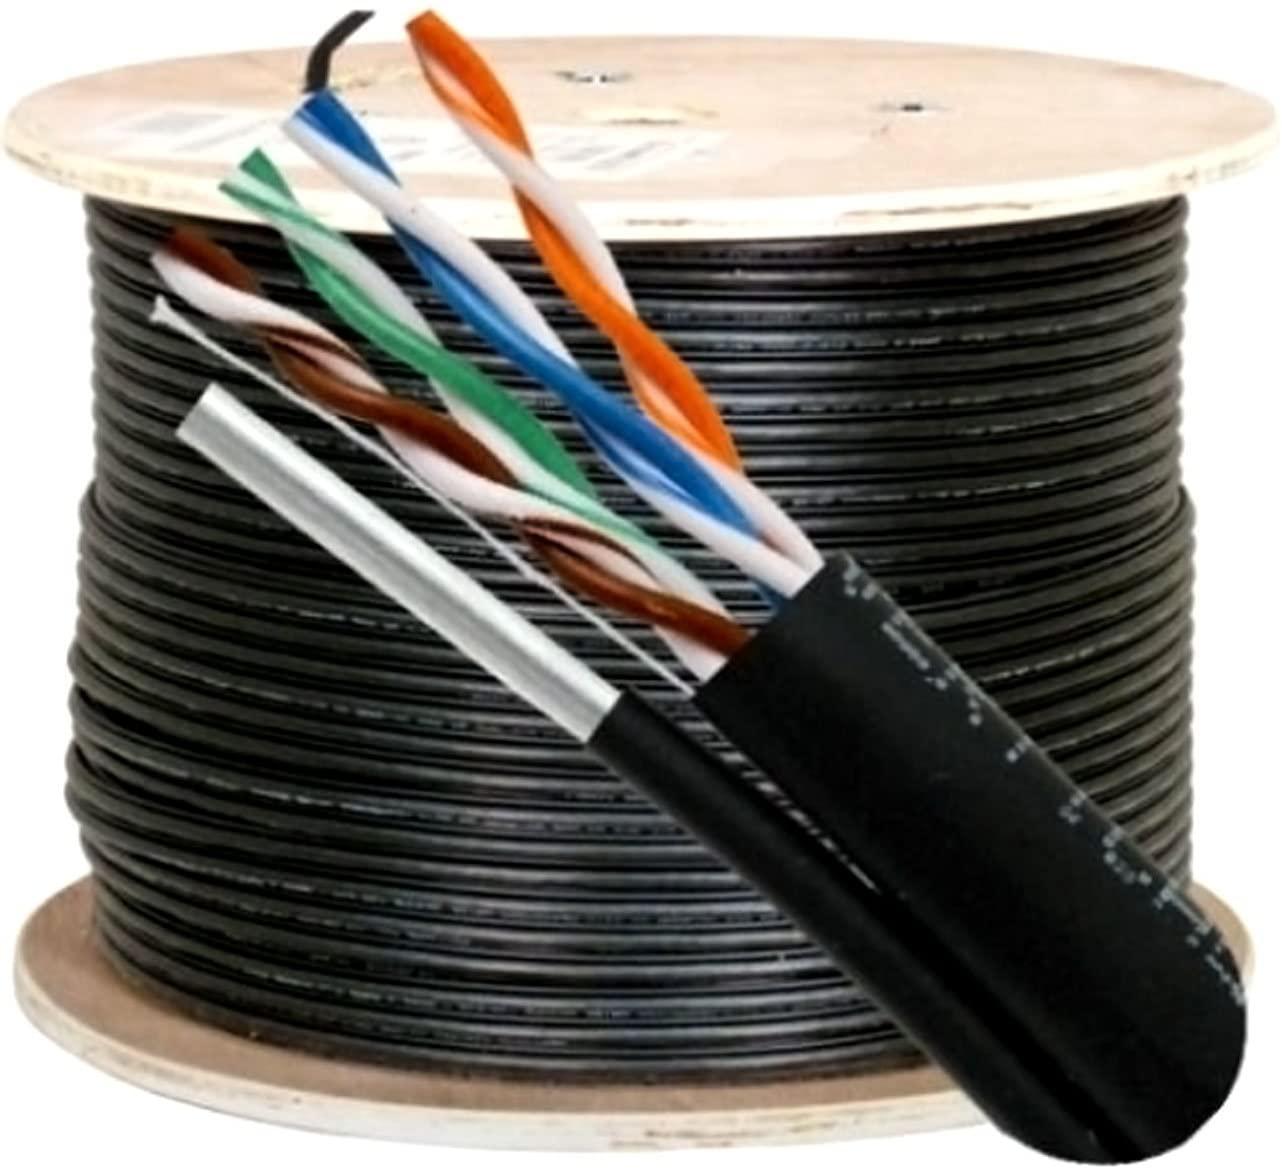 Vertical Cable Cat5e, 350 Mhz, UTP, UV Jacket, Outdoor, CMX, Messenger, 1000ft, Black, Bulk Ethernet Cable, Wooden Spool